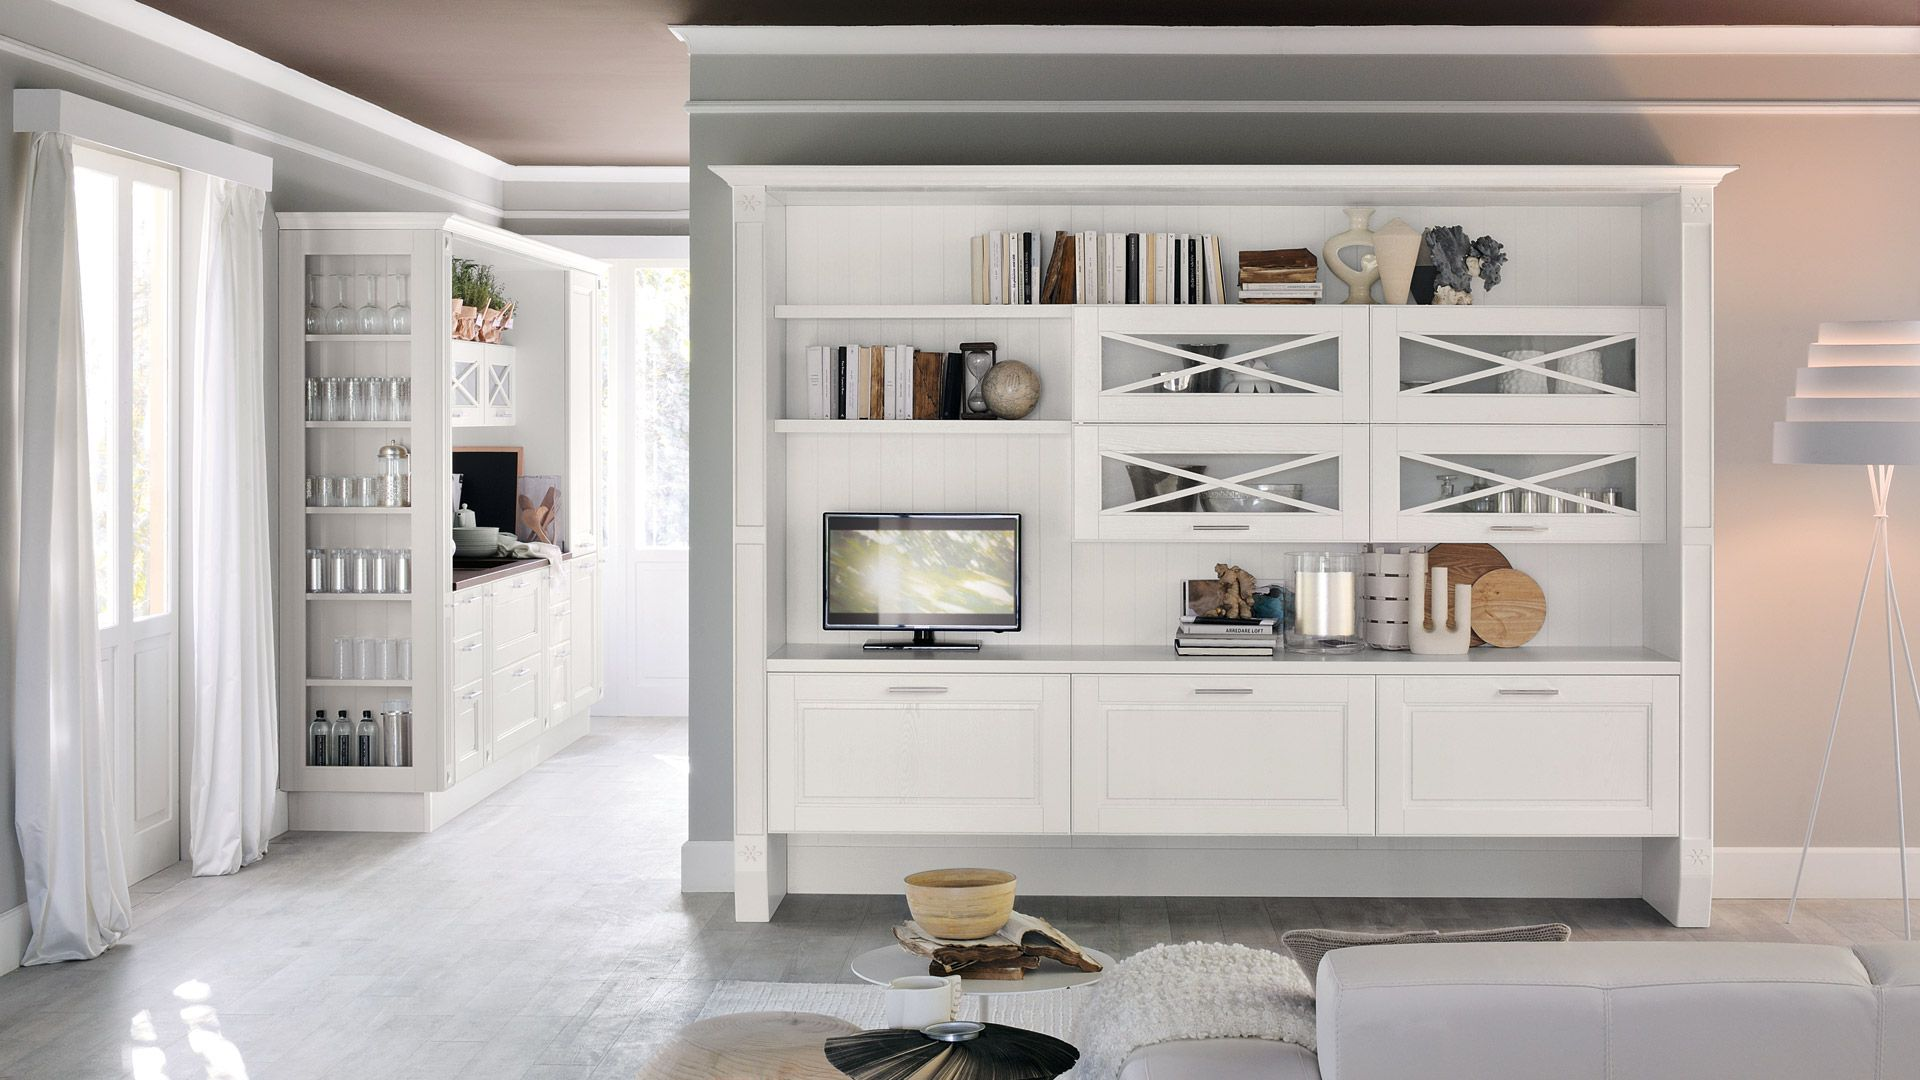 кухня Lube Agnese интерьер в 2019 г дизайн домашнего